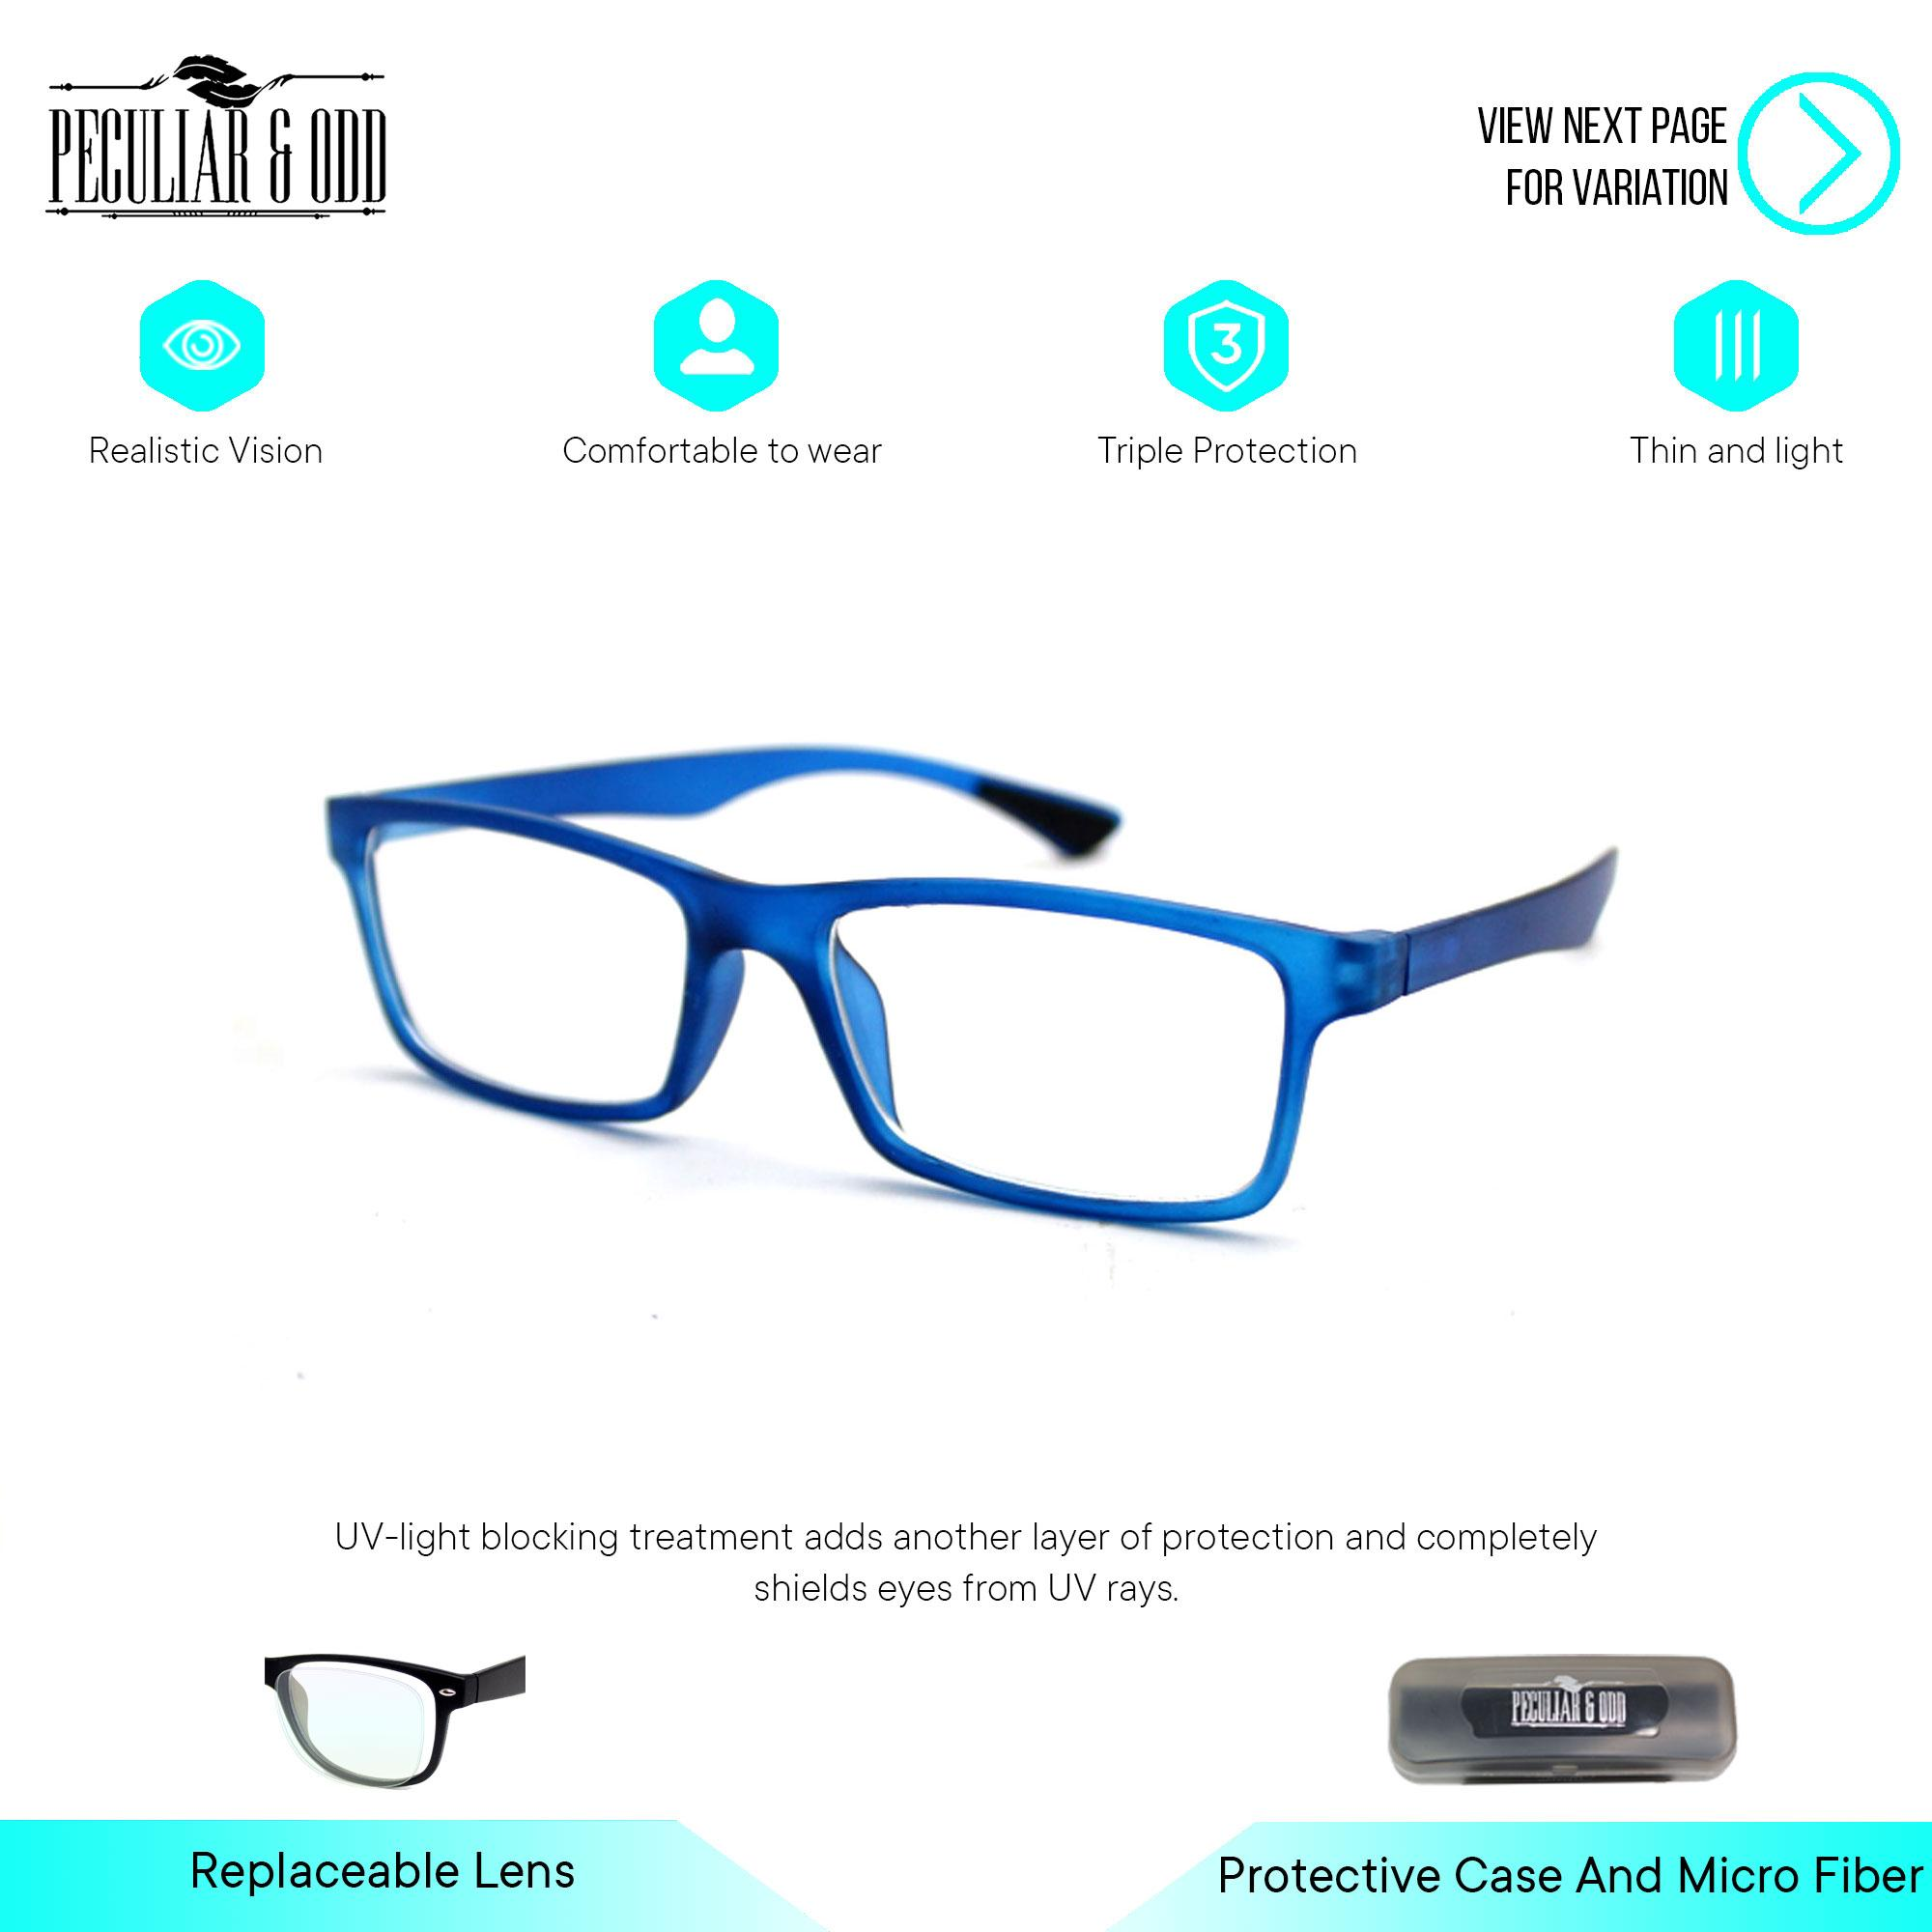 f487d9fc9c Peculiar Premium 8818 SandBlack Computer Anti-Radiation Replaceable Lens  Eyeglass  Unisex Eyewear Optical Frame Anti Blue Light Multicolored Lens -  Unisex ...